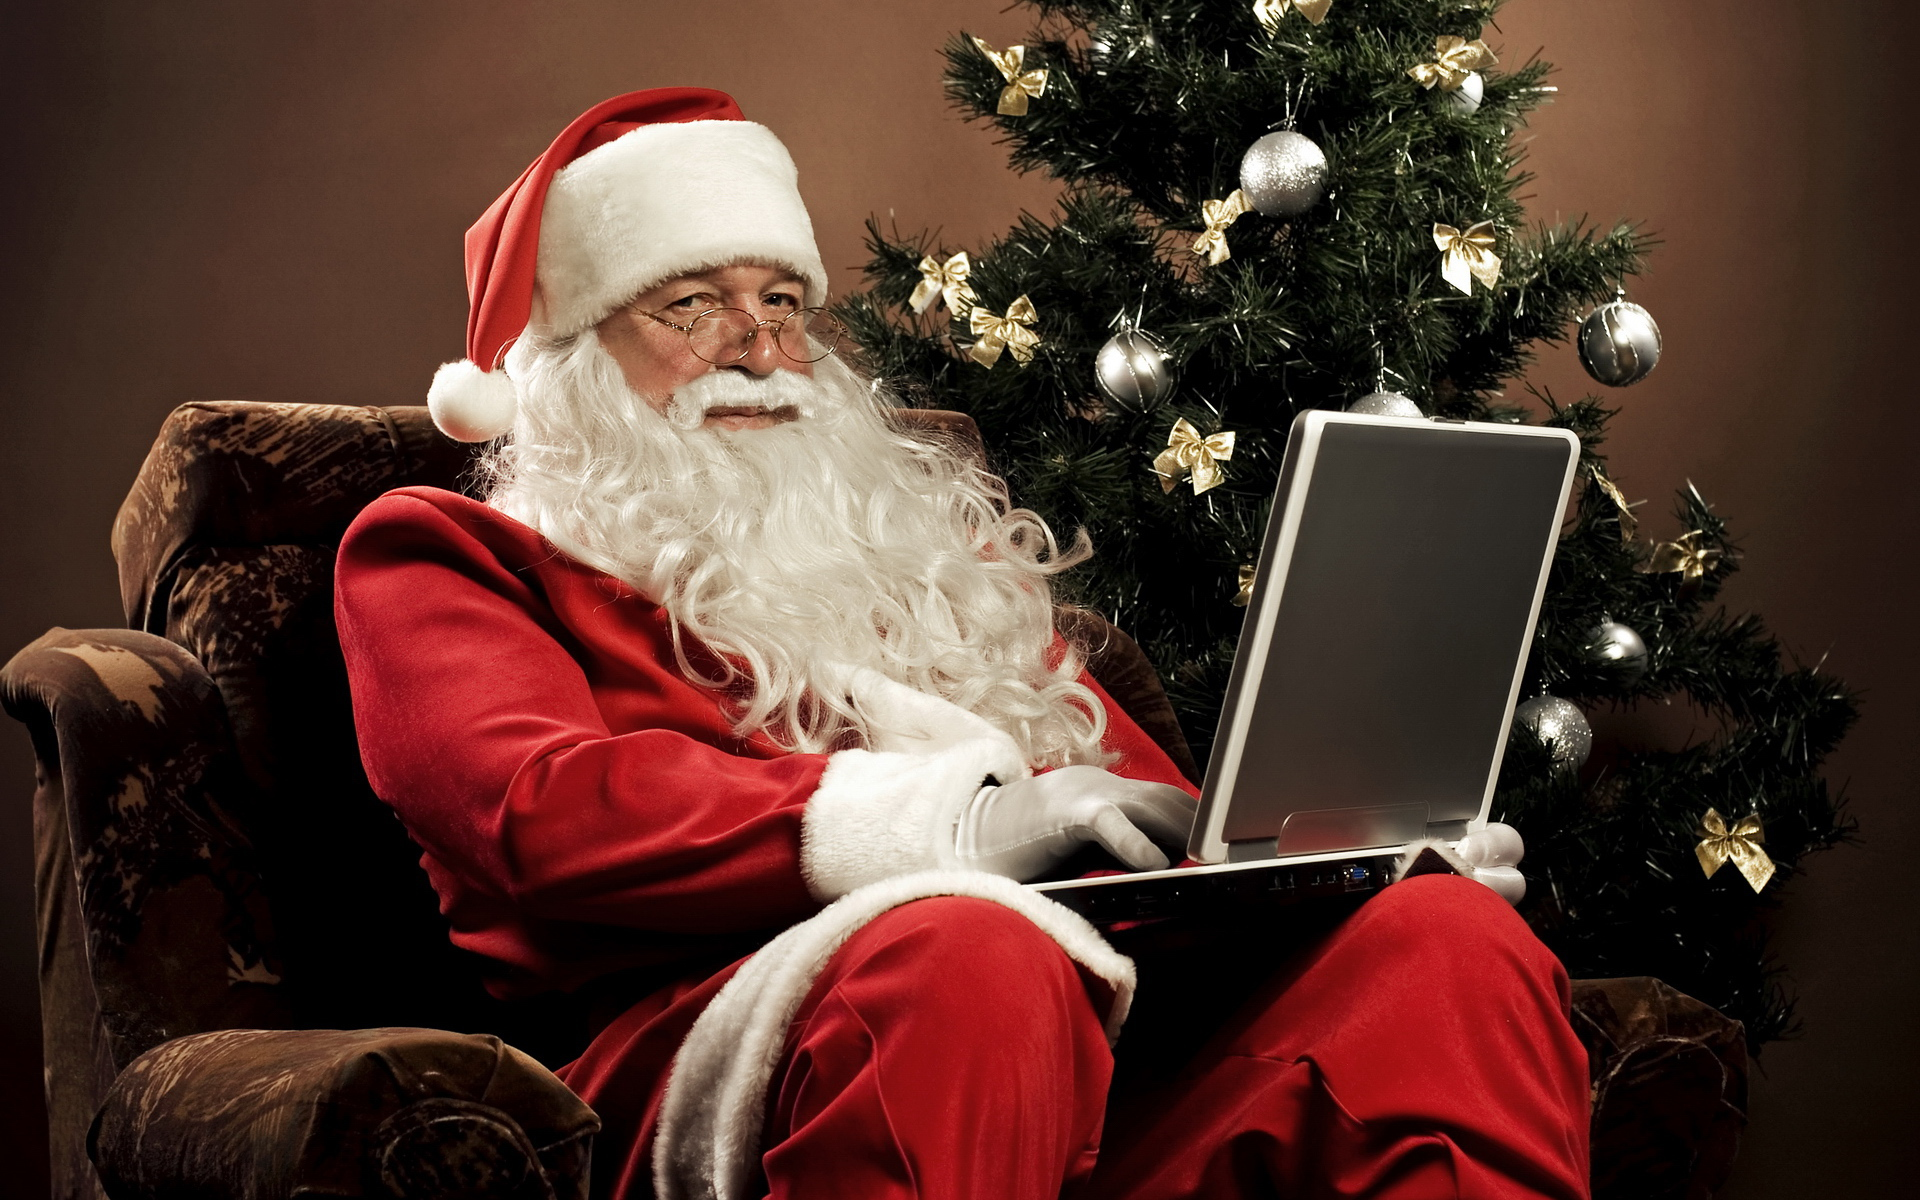 Funny-Santa-Claus-2